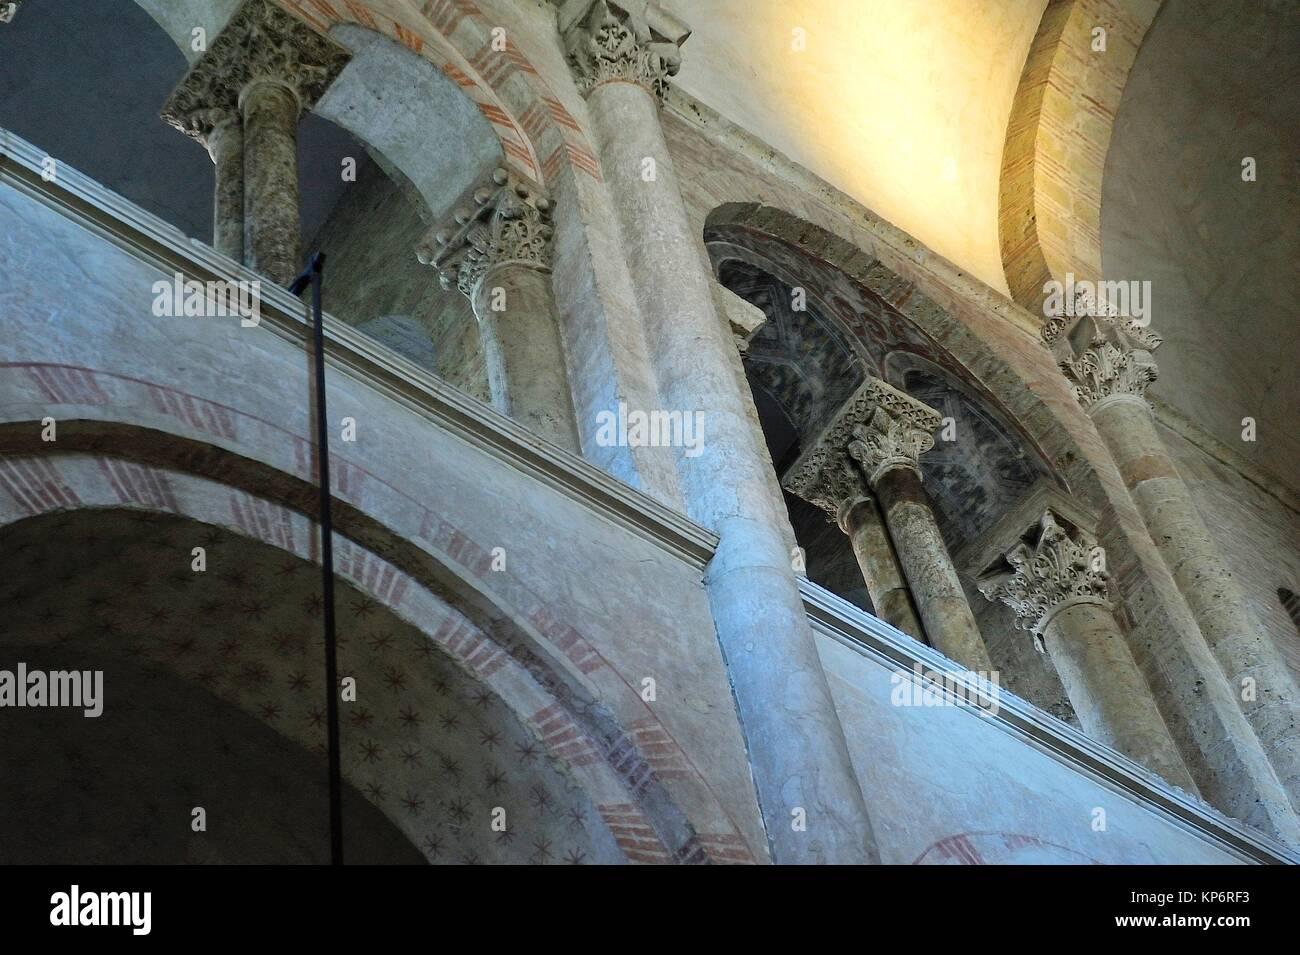 The Romanesque Basilica of Saint-Sernin, XI-XIIth centuries, is a UNESCO World Heritage Site. Toulouse, Haute-Garonne - Stock Image